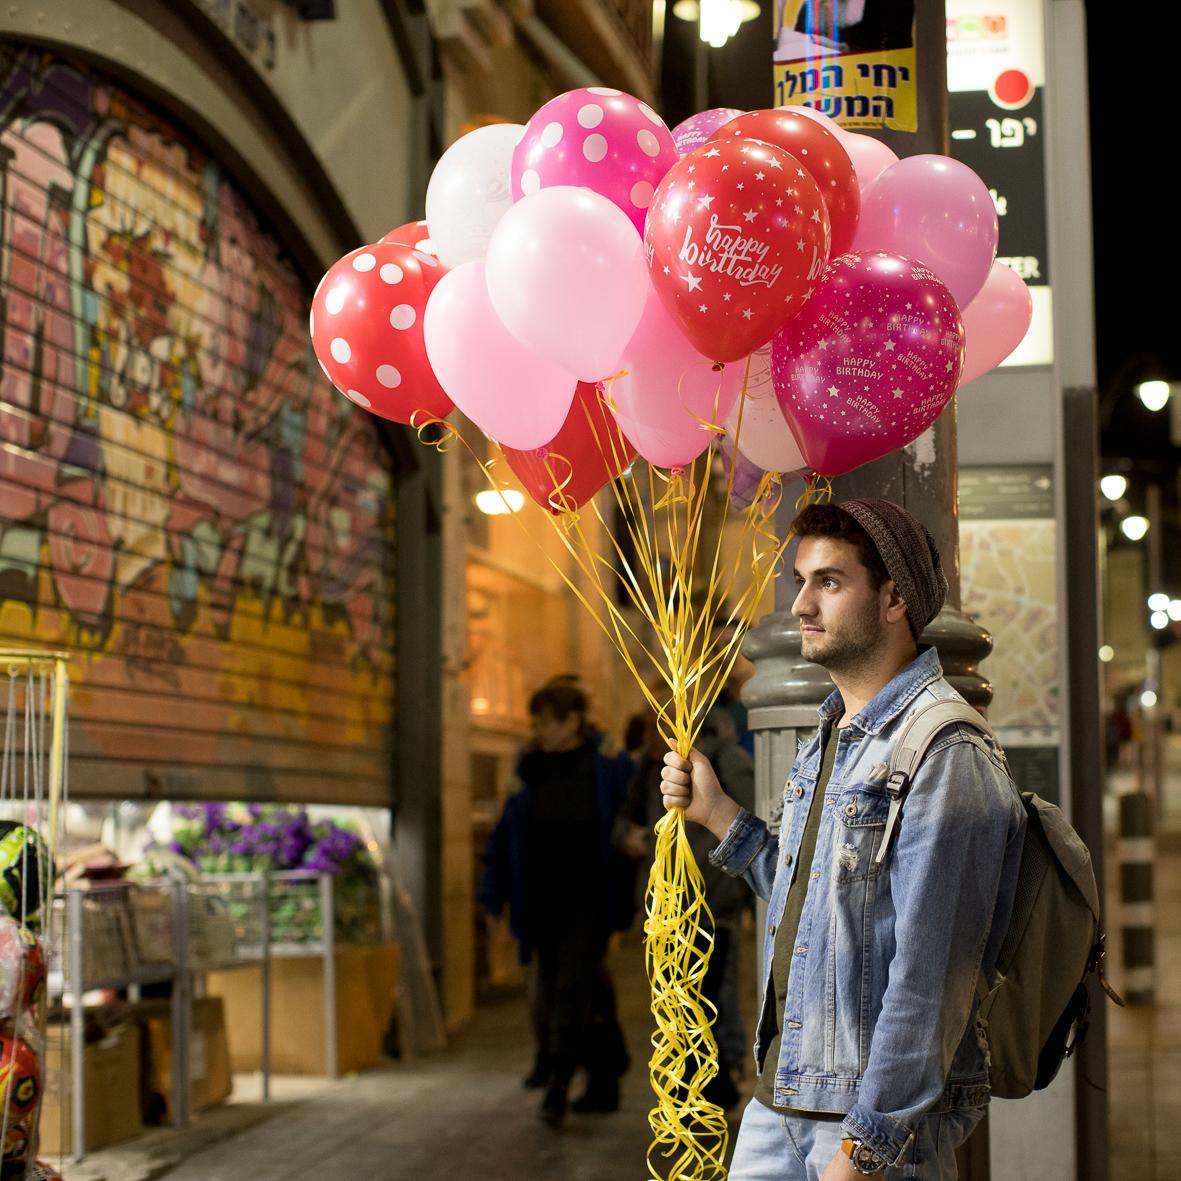 Mann mit Ballons, Tel Aviv